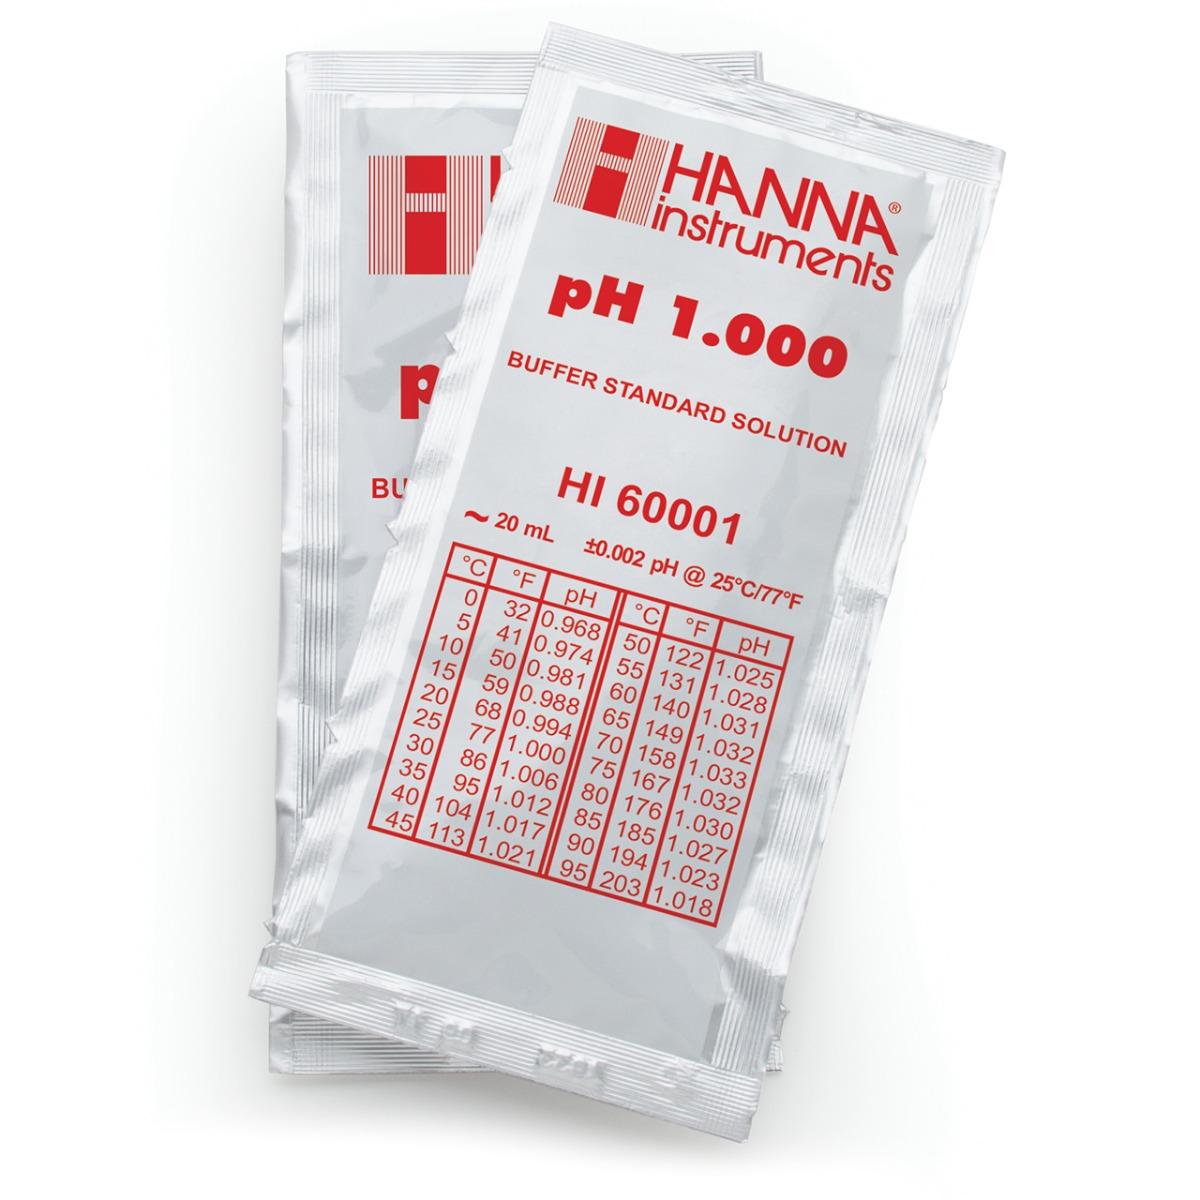 HI60001-02 pH 1.000 Millesimal Buffer Solution (25 x 20 mL) Sachets